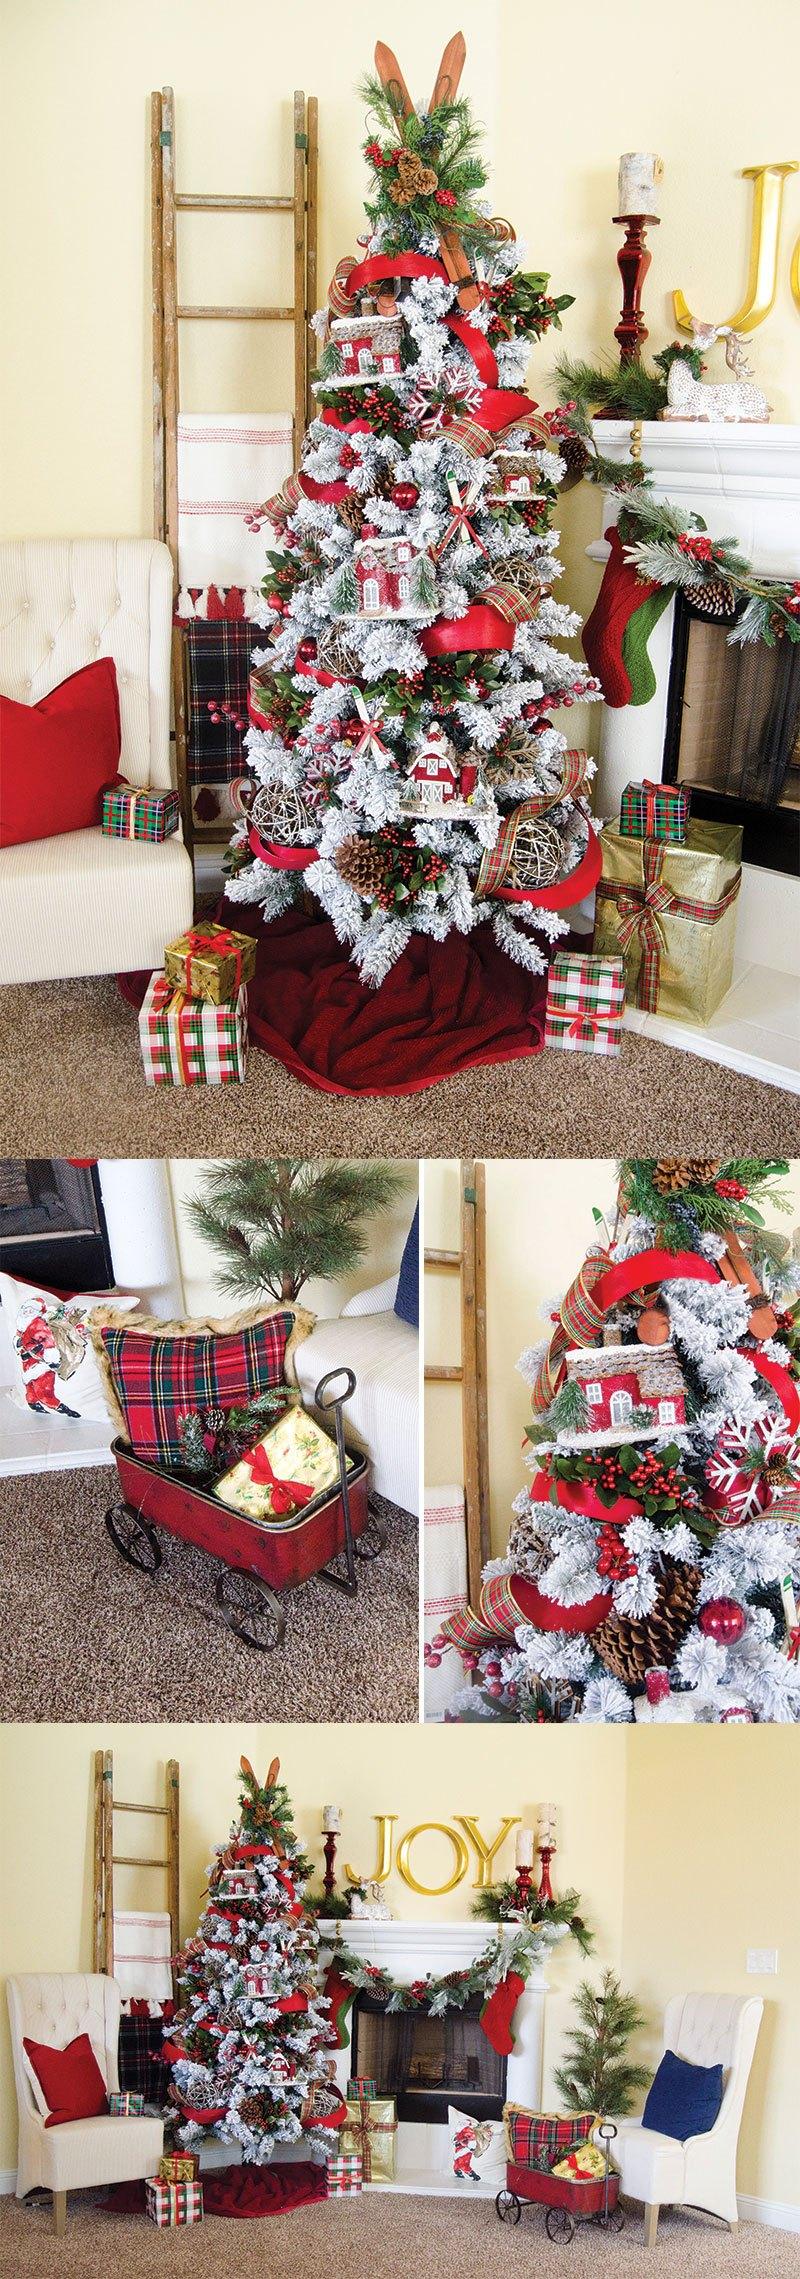 Plaid Christmas Tree Decor Idea by Lindi Haws